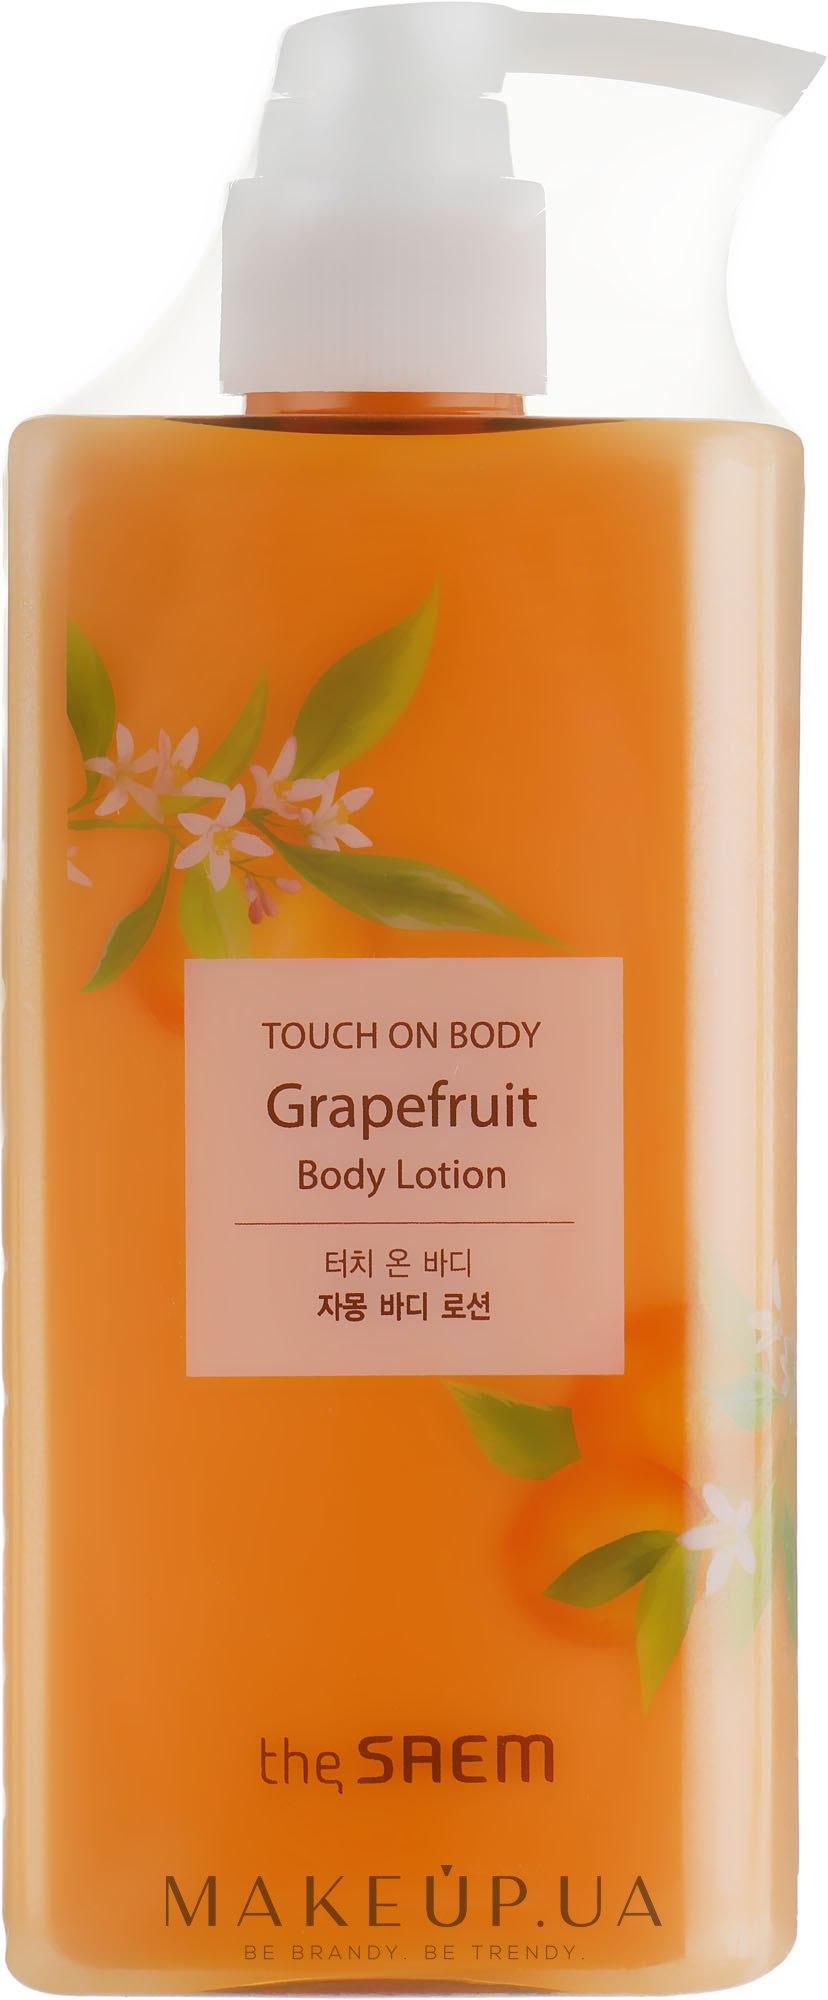 Лосьон для тела - The Saem Touch On Body Grapefruit Body Lotion — фото 300ml